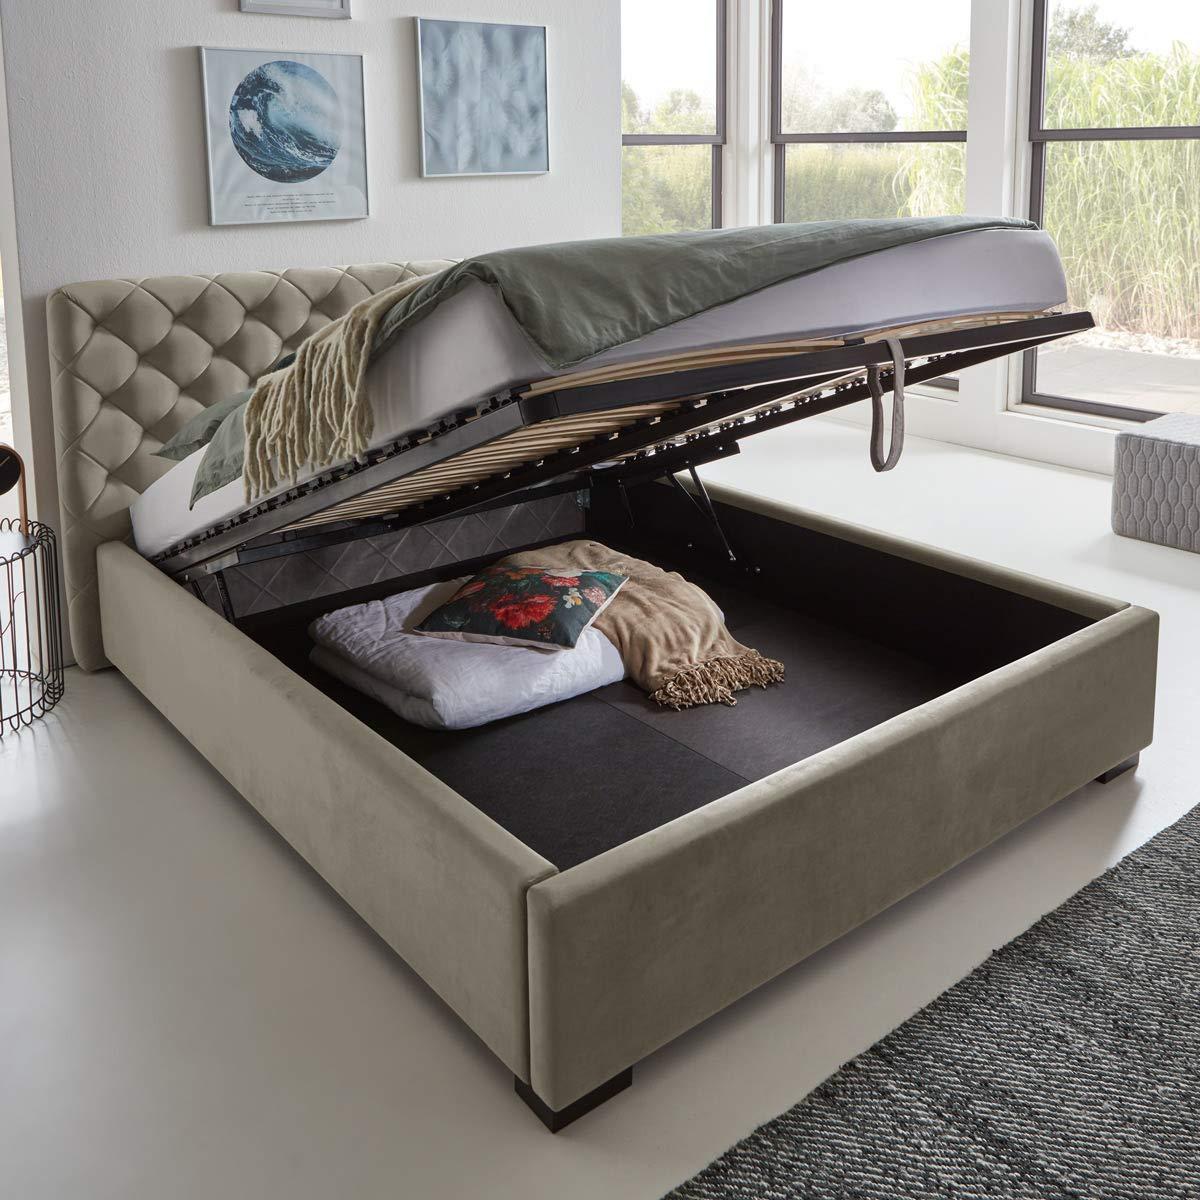 Full Size of Polsterbett 200x220 Designer Betten Bett Mit Bettkasten Elsa Samt Stoff Wohnzimmer Polsterbett 200x220